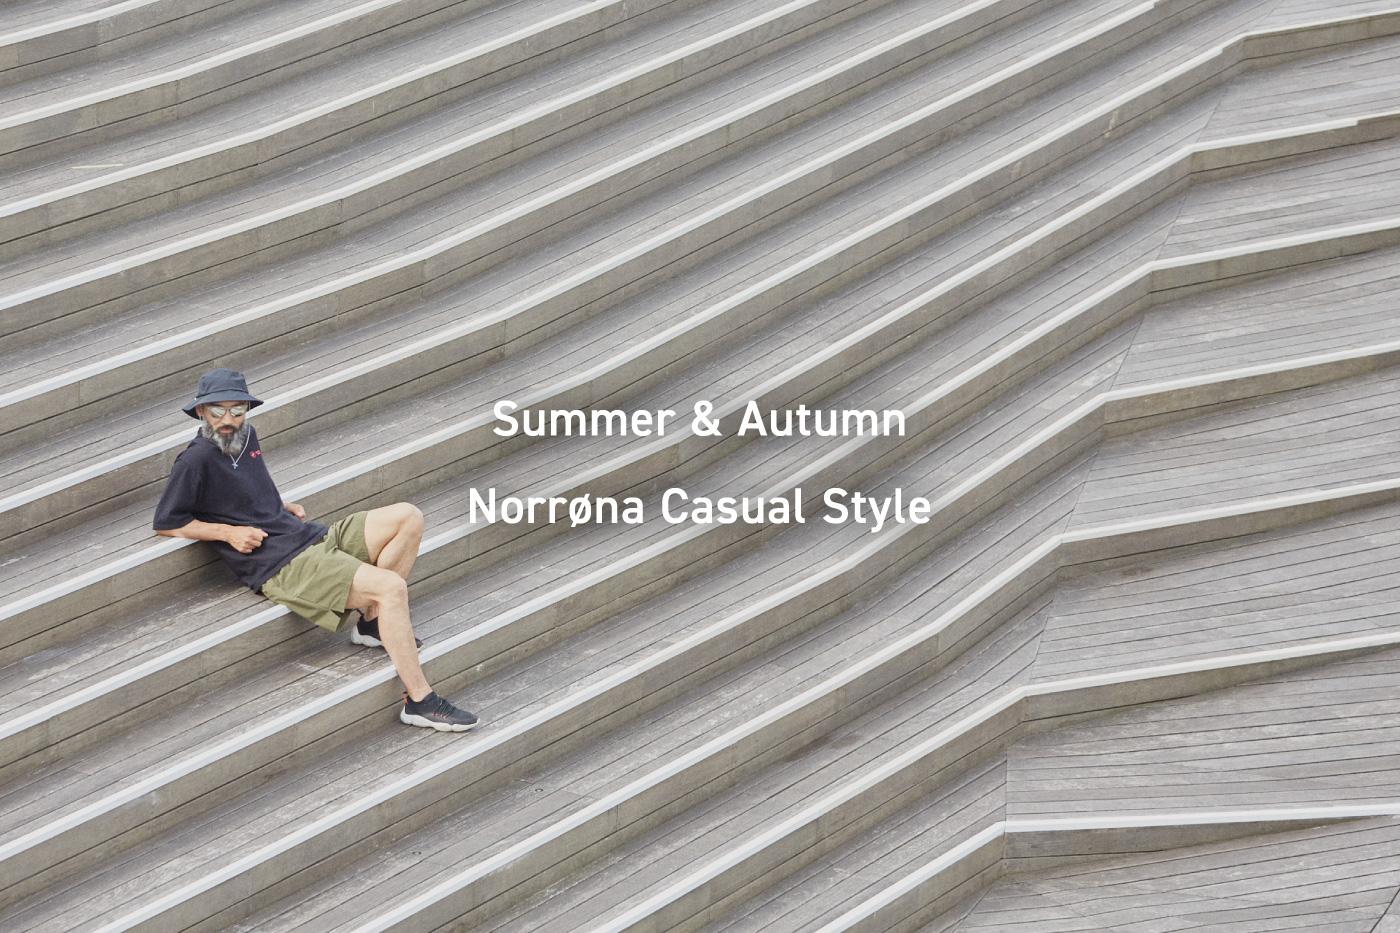 Summer & Autumn Norrøna Casual Style